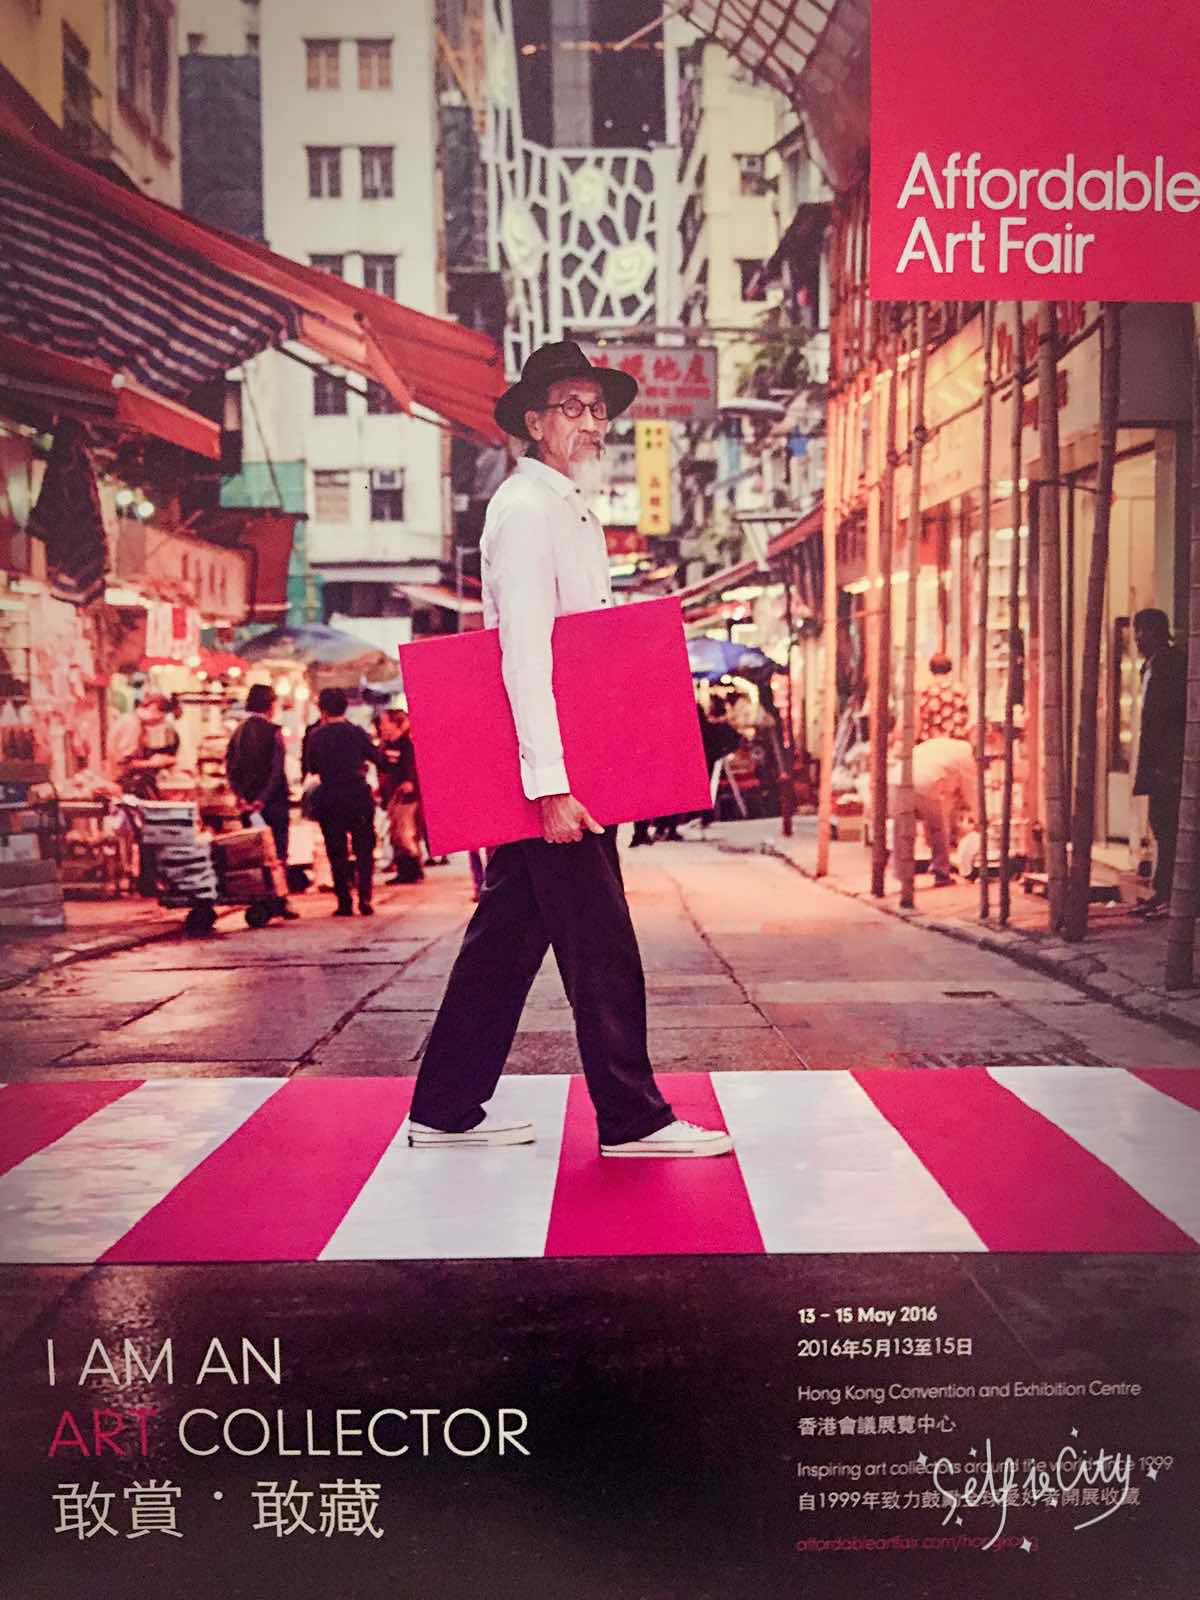 affordable-art-fair-hongkong-image1